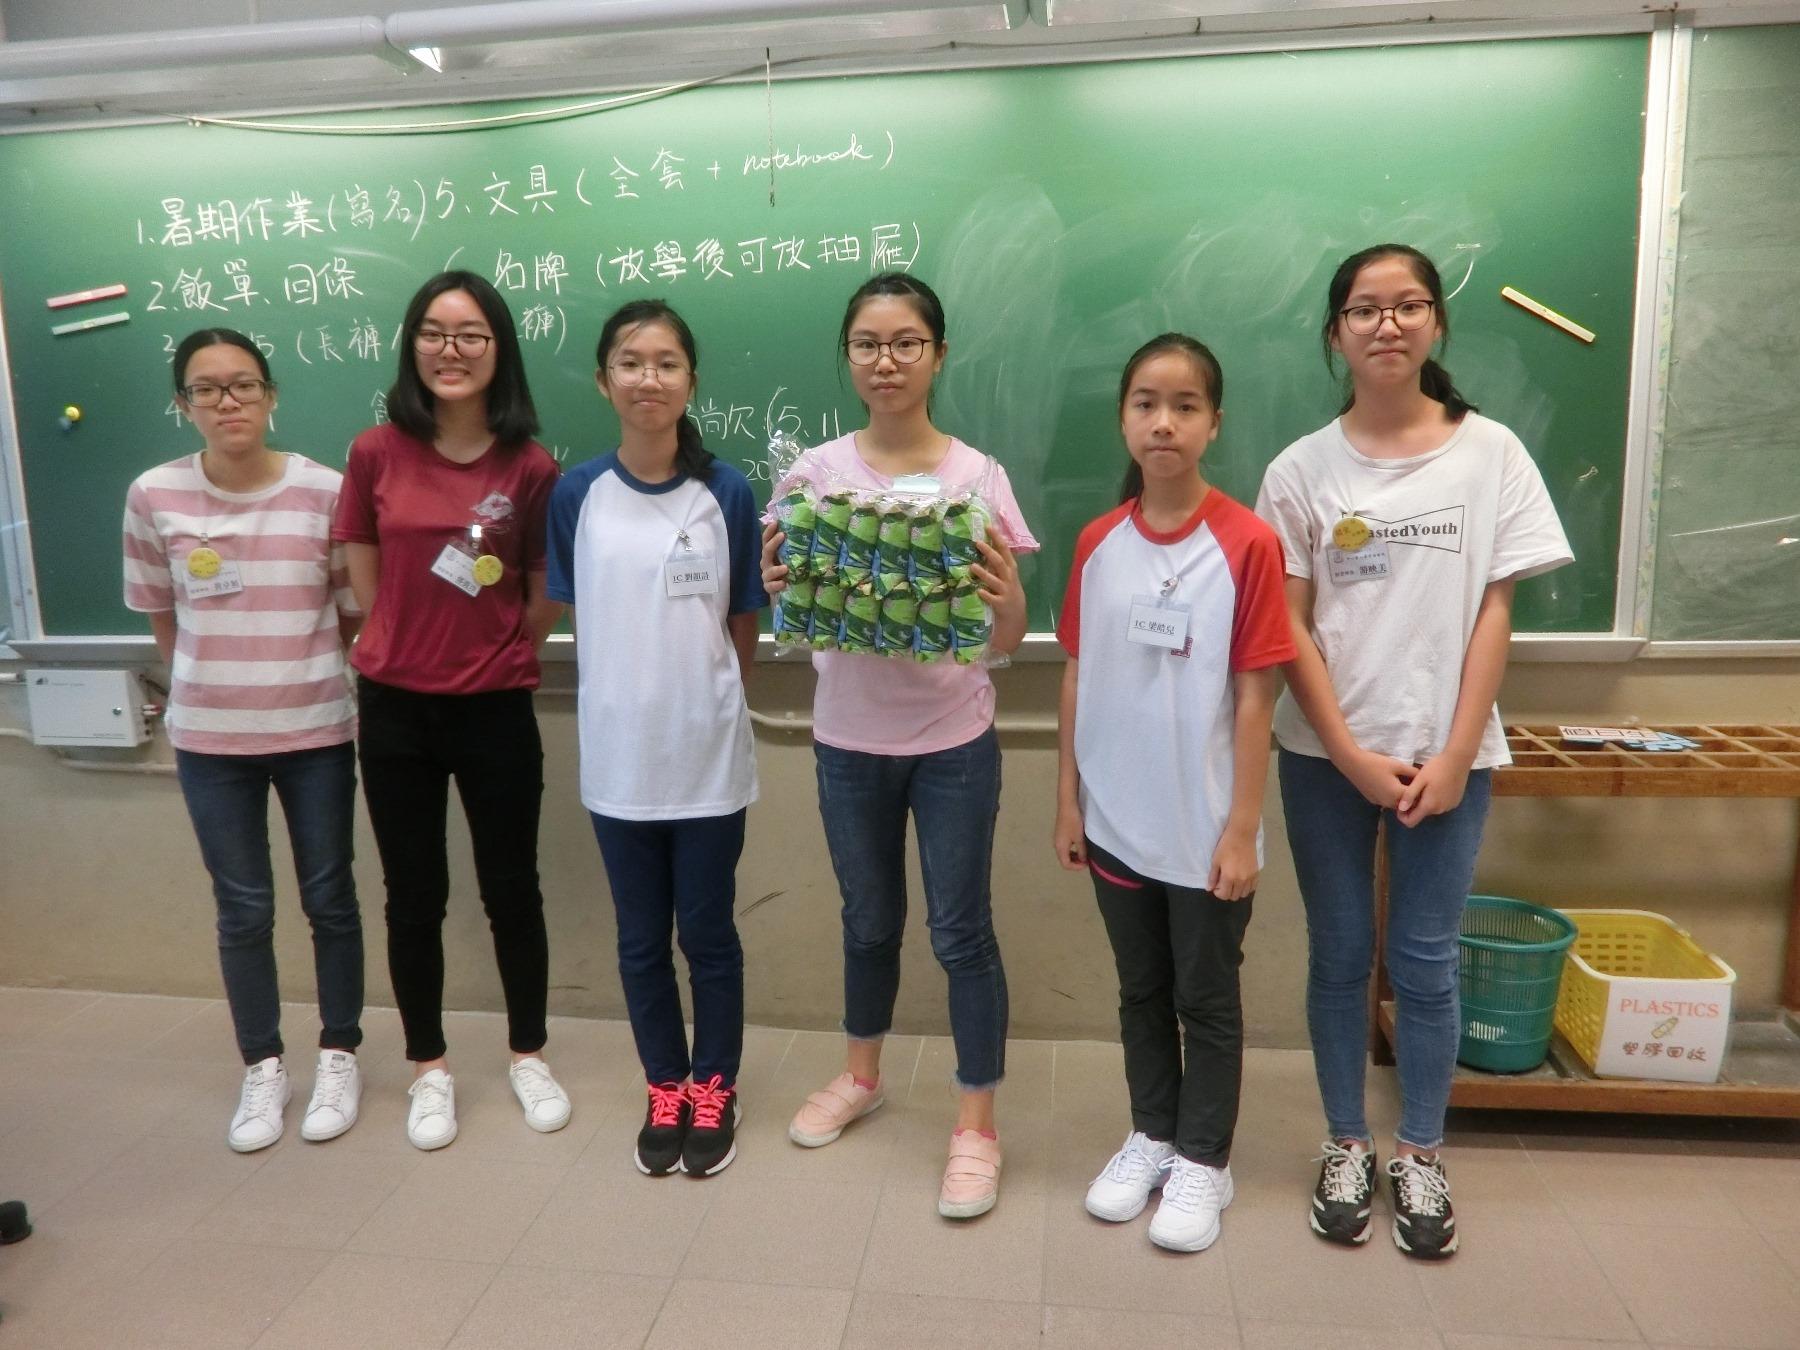 https://www.npc.edu.hk/sites/default/files/1c_wen_gu_zhi_xin_04.jpg